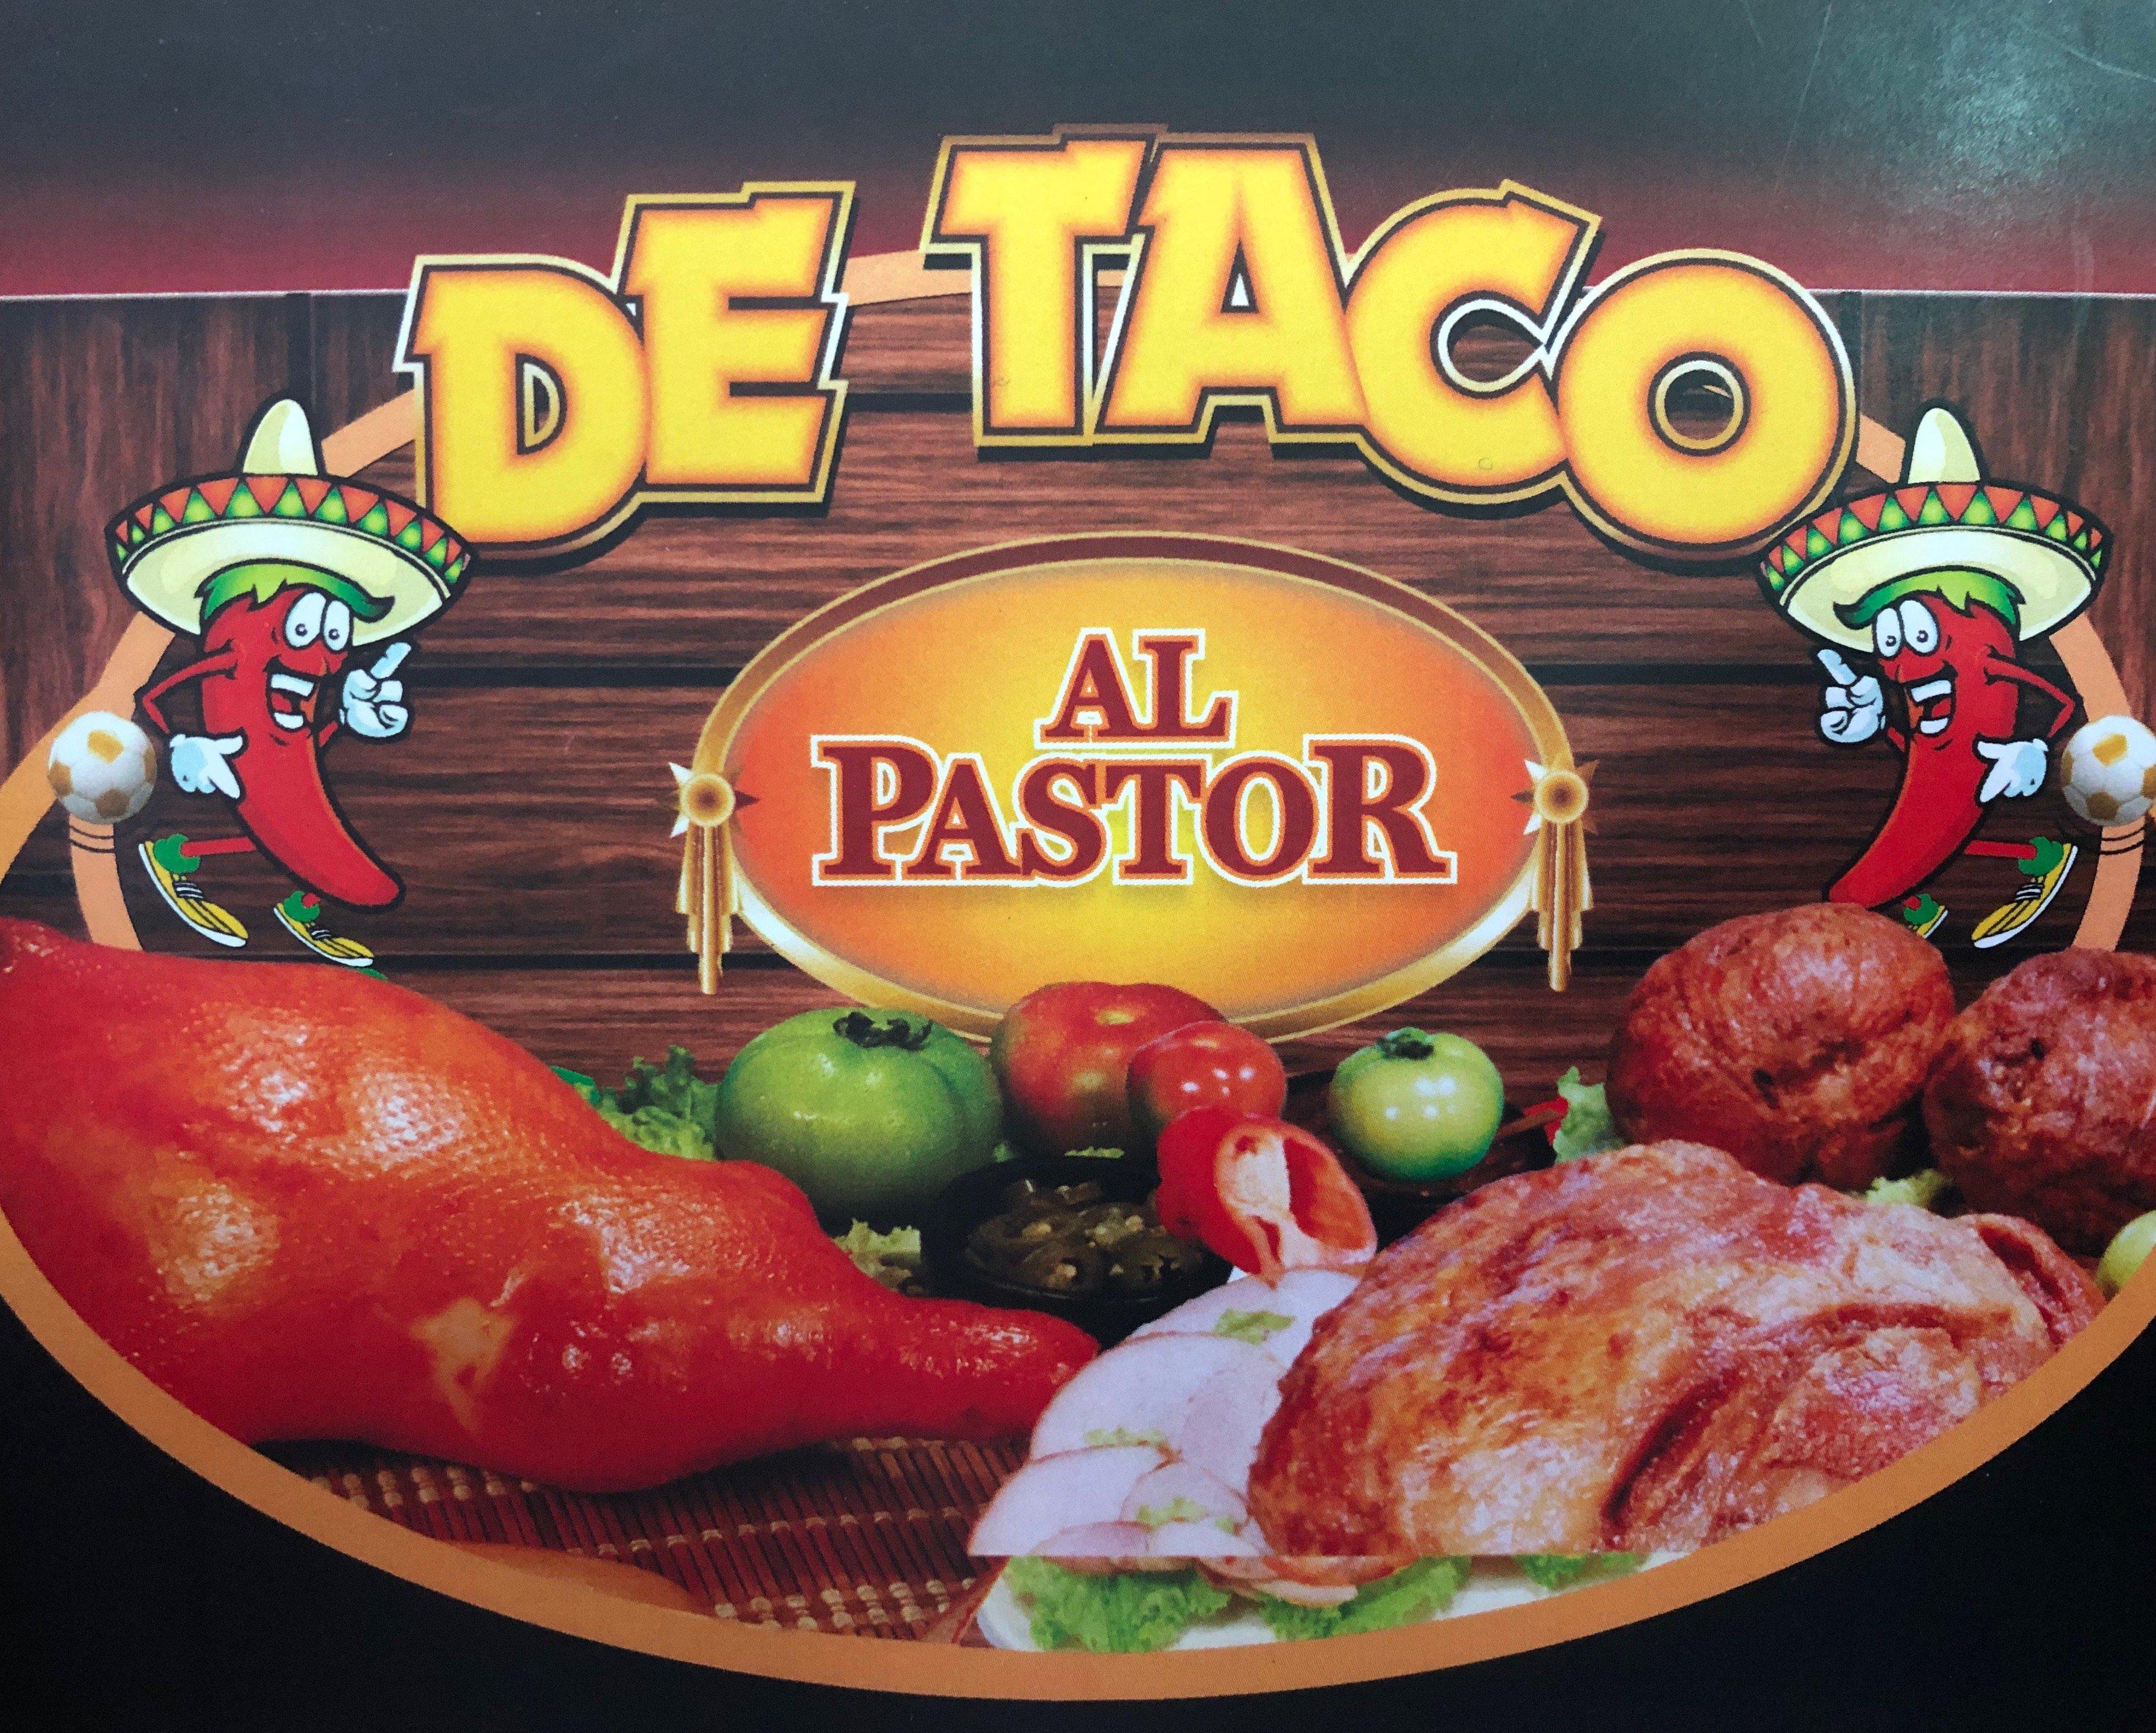 De Taco